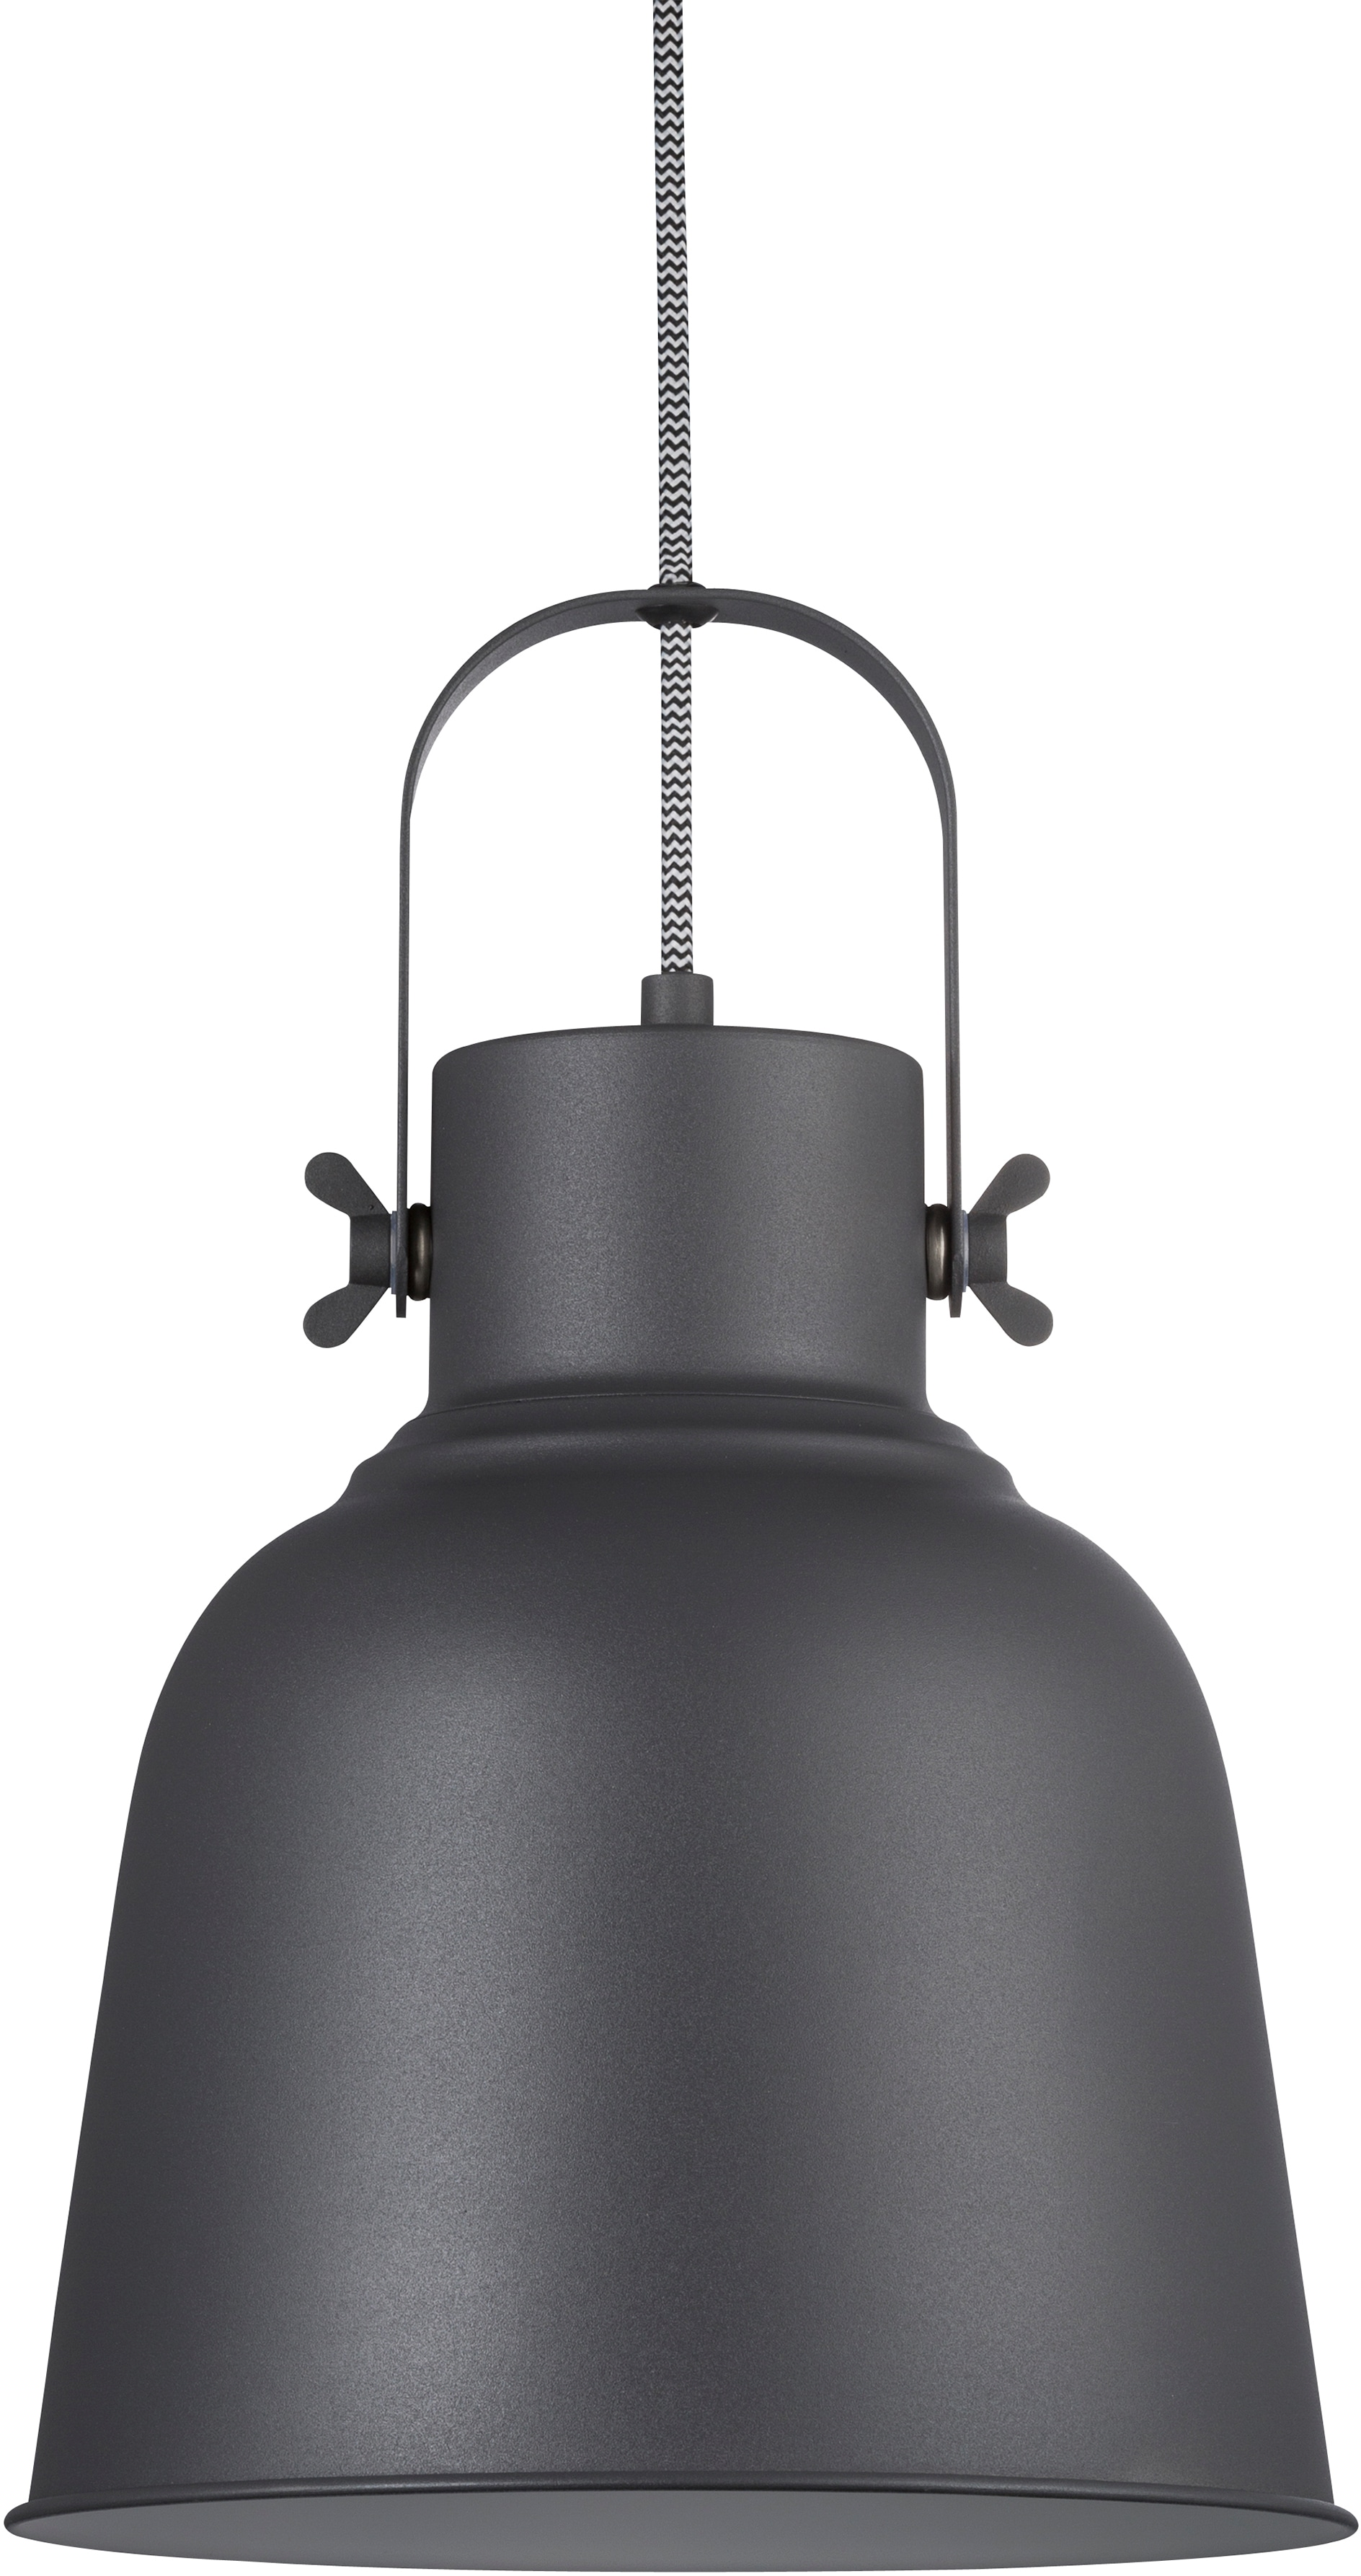 Nordlux Pendelleuchte ADRIAN, E27, Hängeleuchte, Retro, Industrial Look, Pendelleuchte